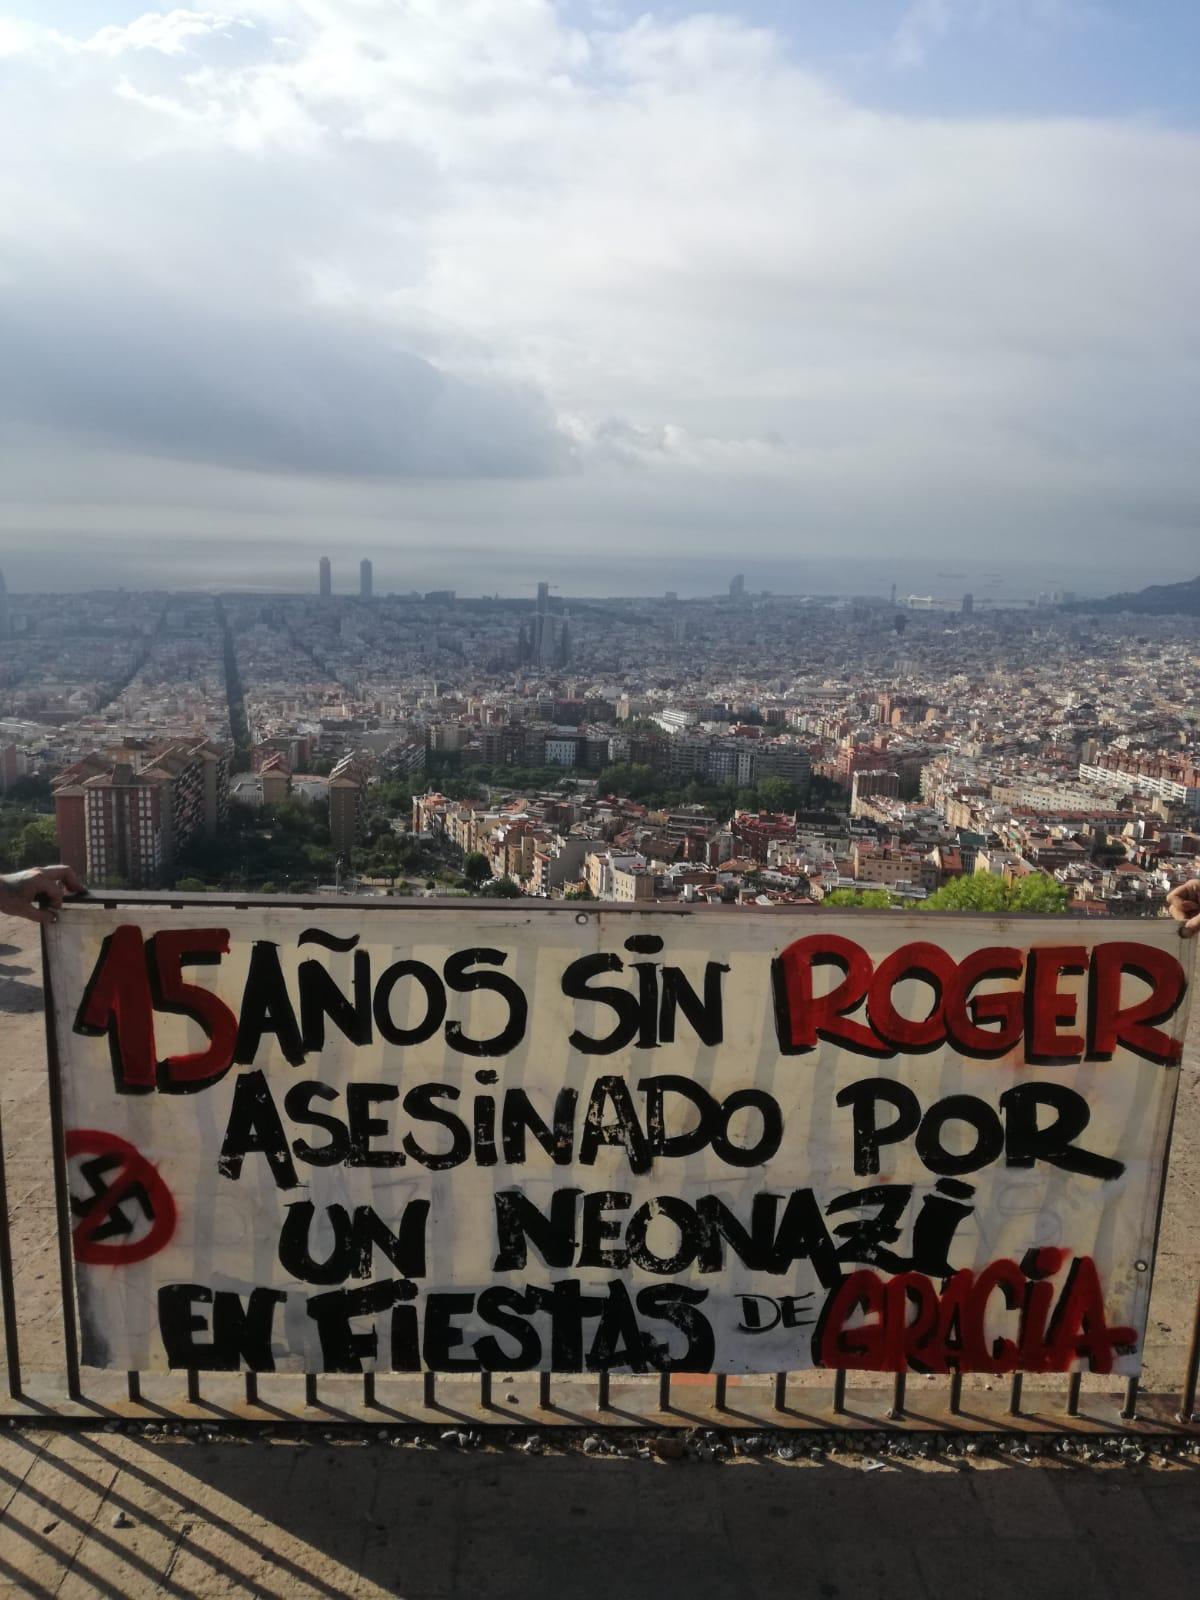 Foto Pancarta 15 Años Sin Roger (1).jpg